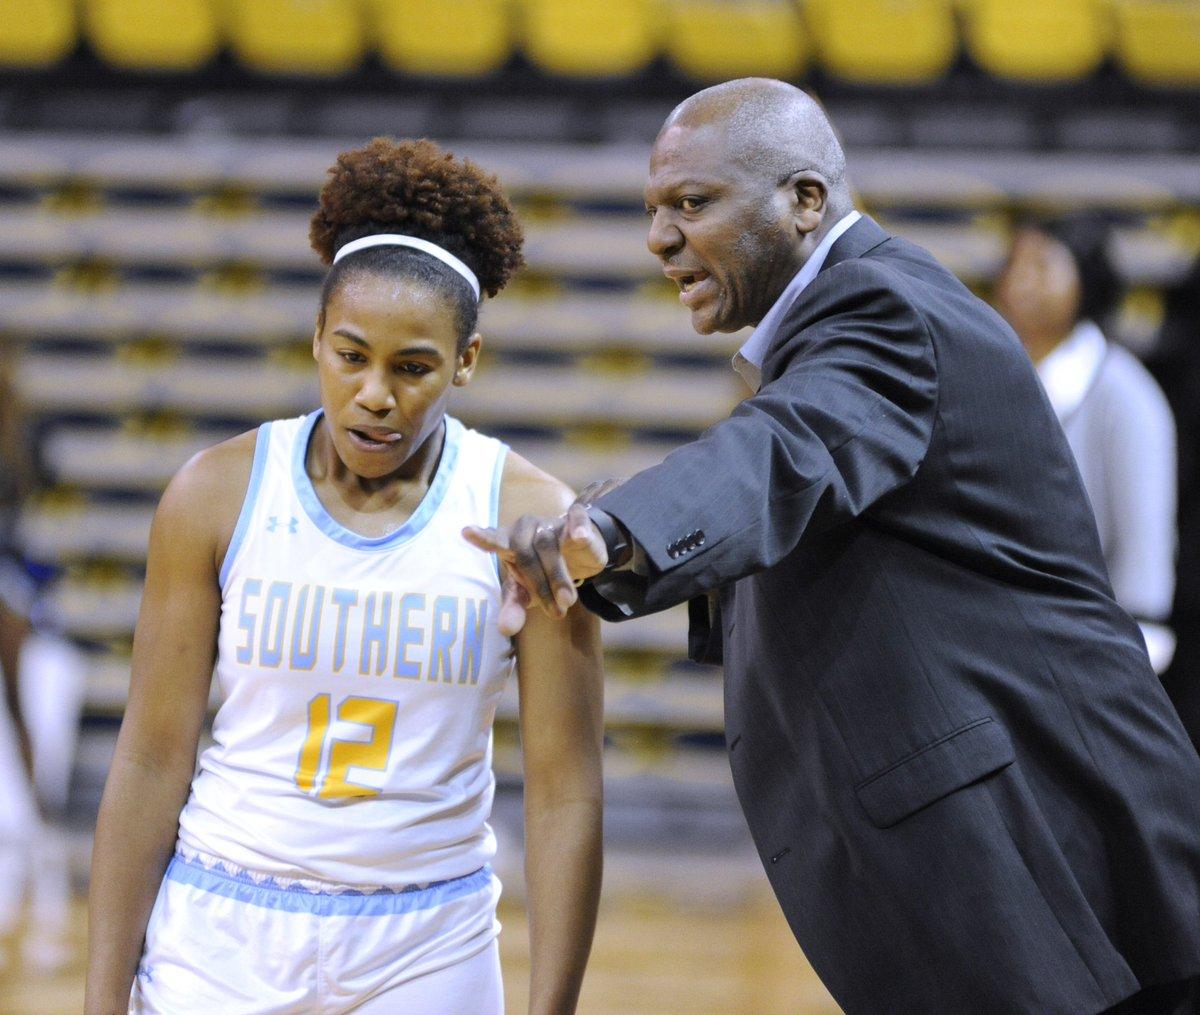 boro womens basketball coach - HD1200×849